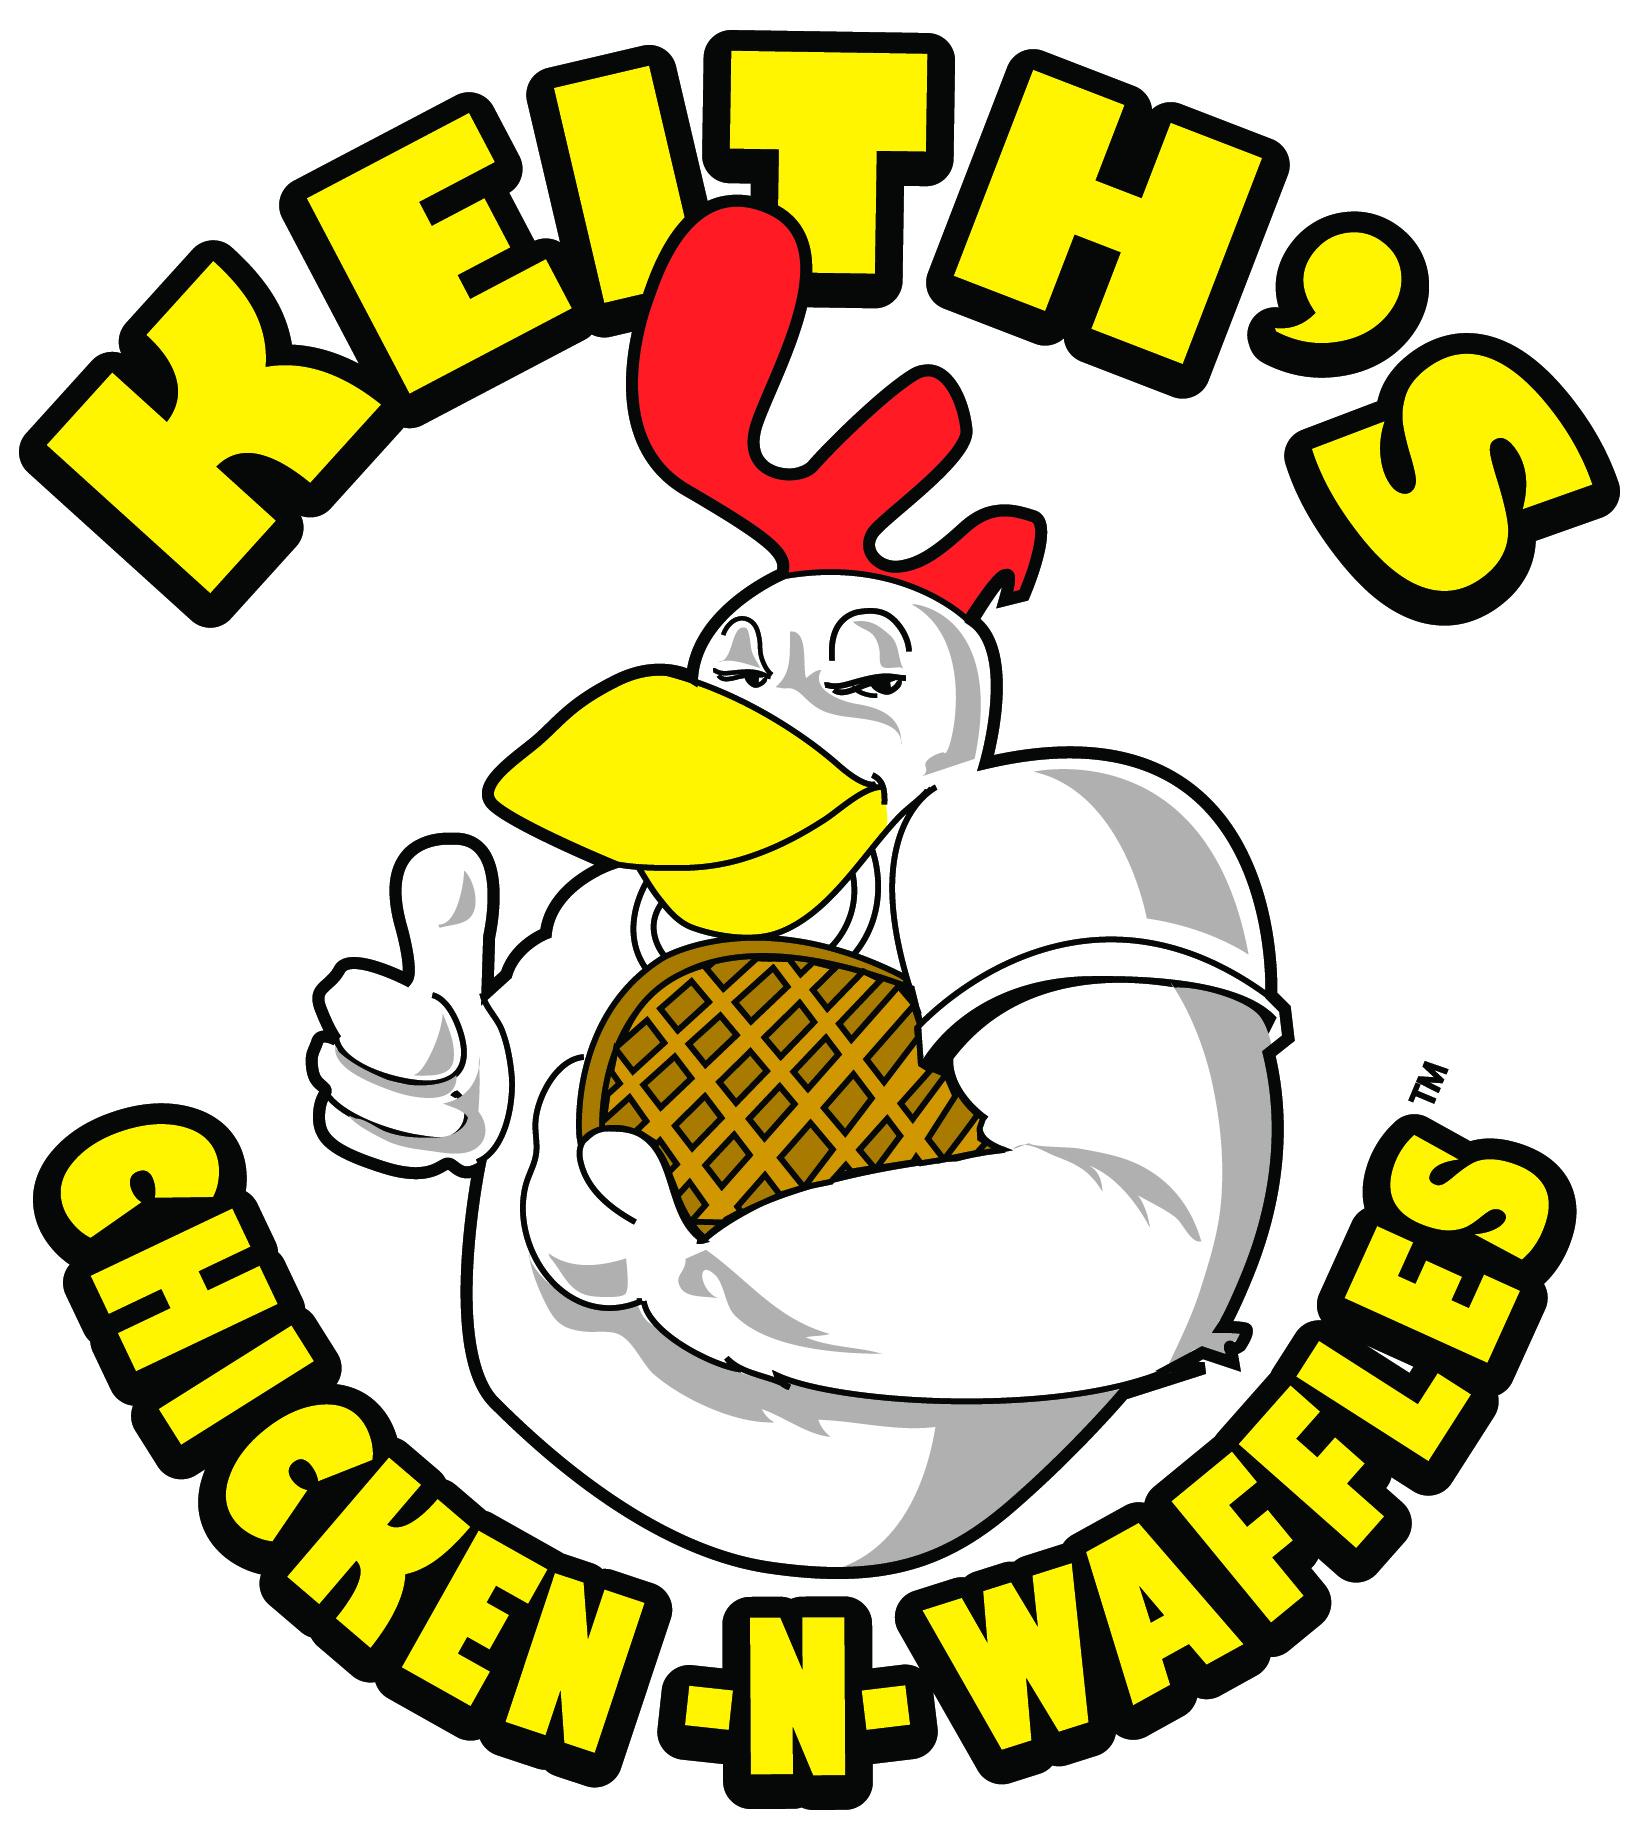 Keith's Chicken-N-Waffles - Logo Design